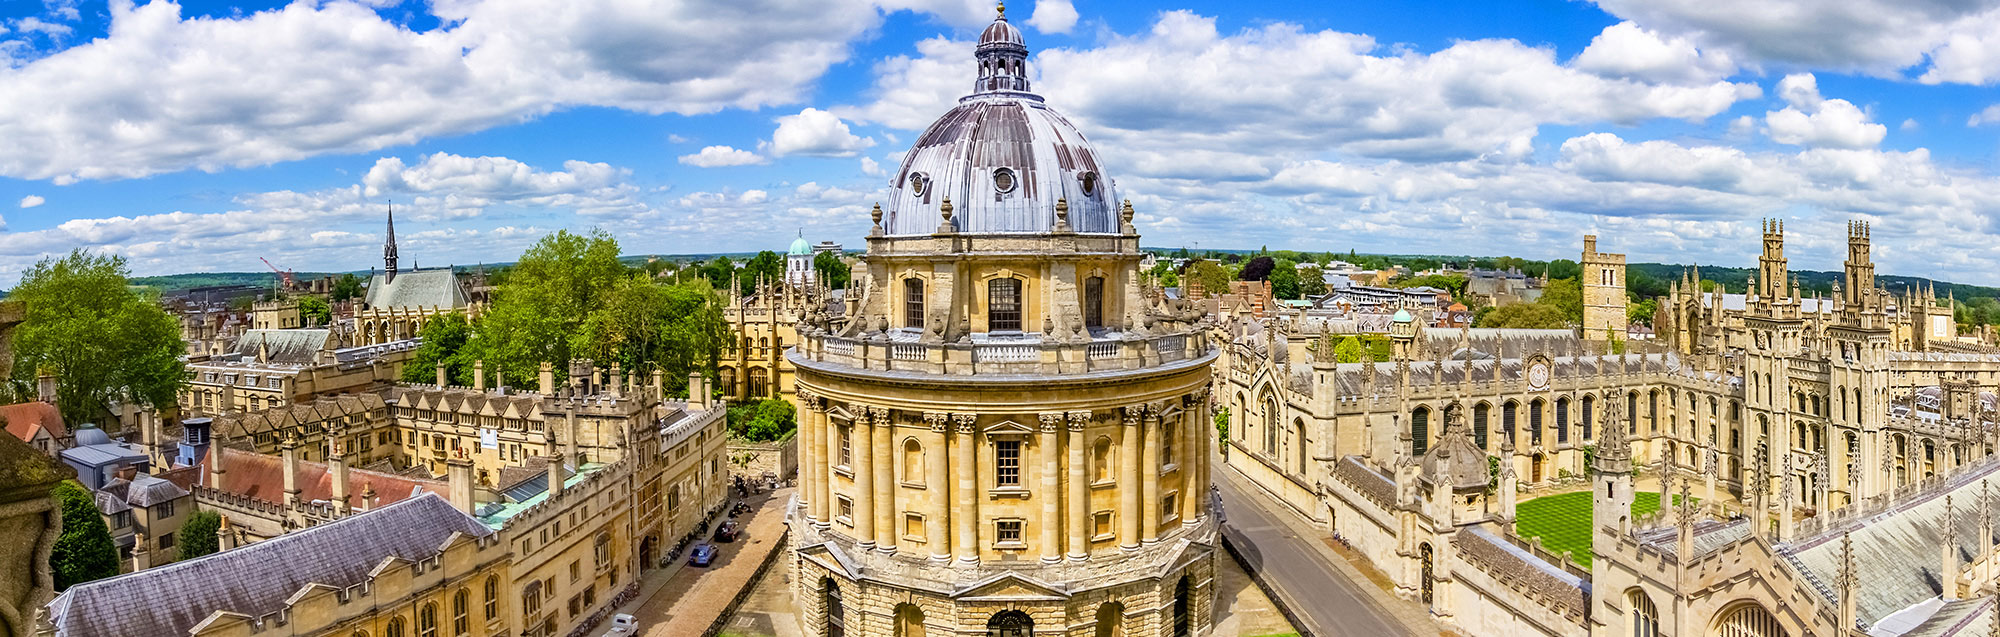 Studio Di Architettura In Inglese vacanze studio di inglese a oxford